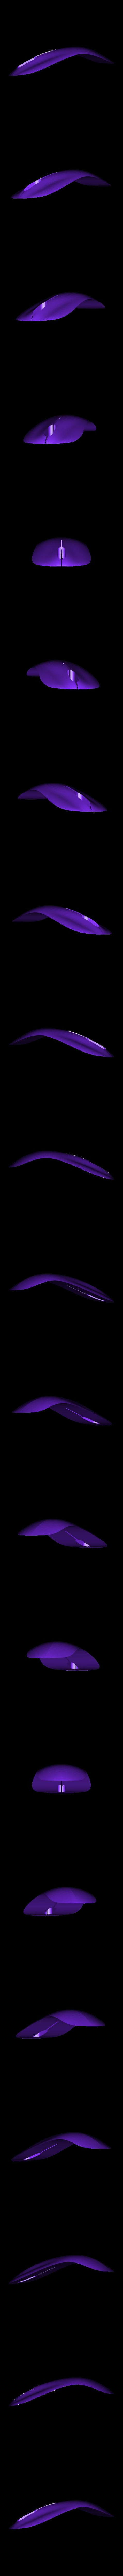 V1_mouse_top.STL Download free STL file Multi-Color Computer Mouse Model: Industrial/Product Design • 3D printable model, MosaicManufacturing